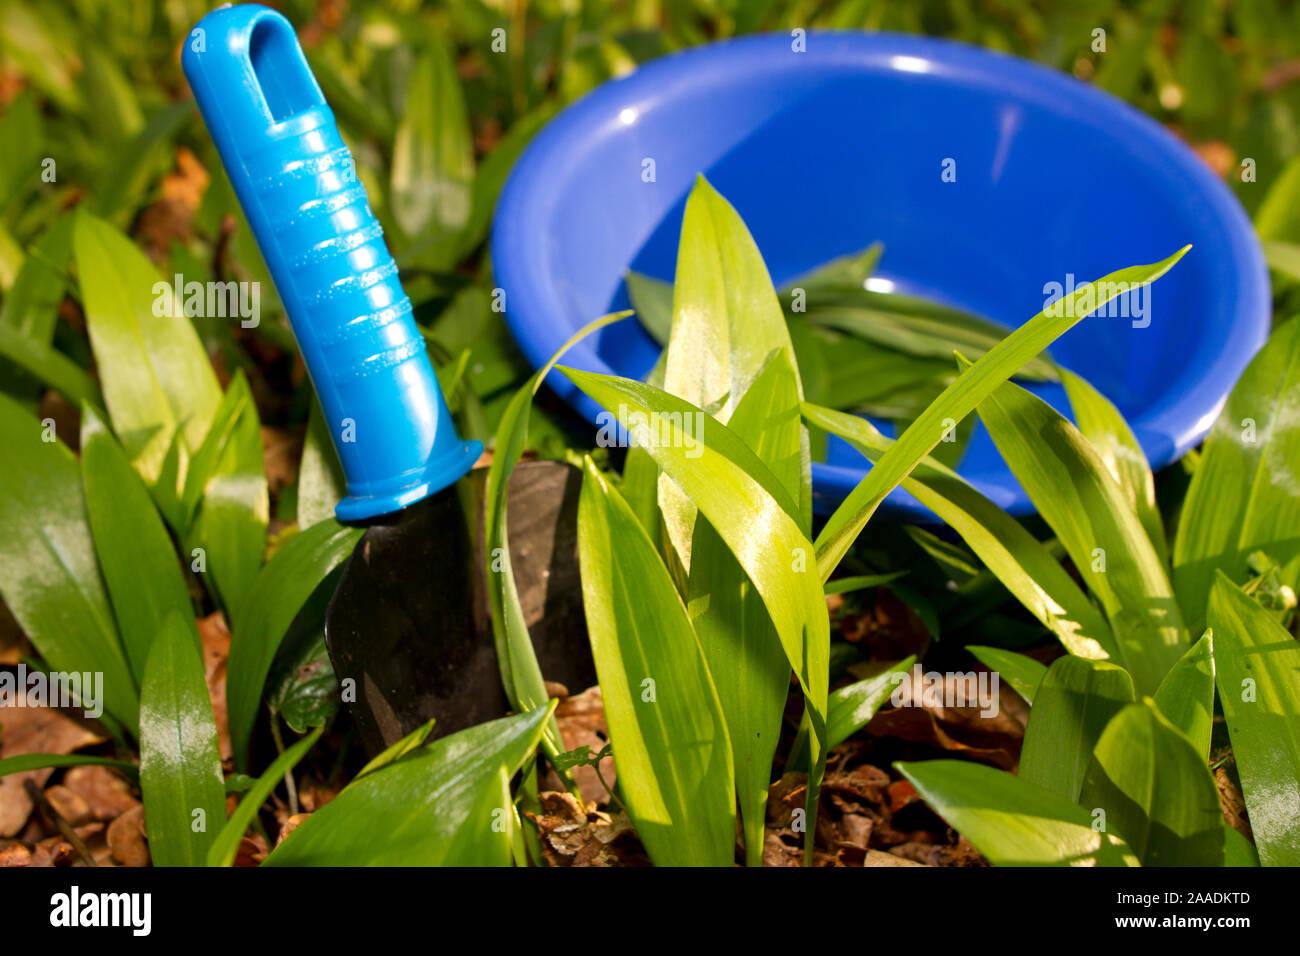 Bärlauch ausstechen, Allium ursinum Stock Photo